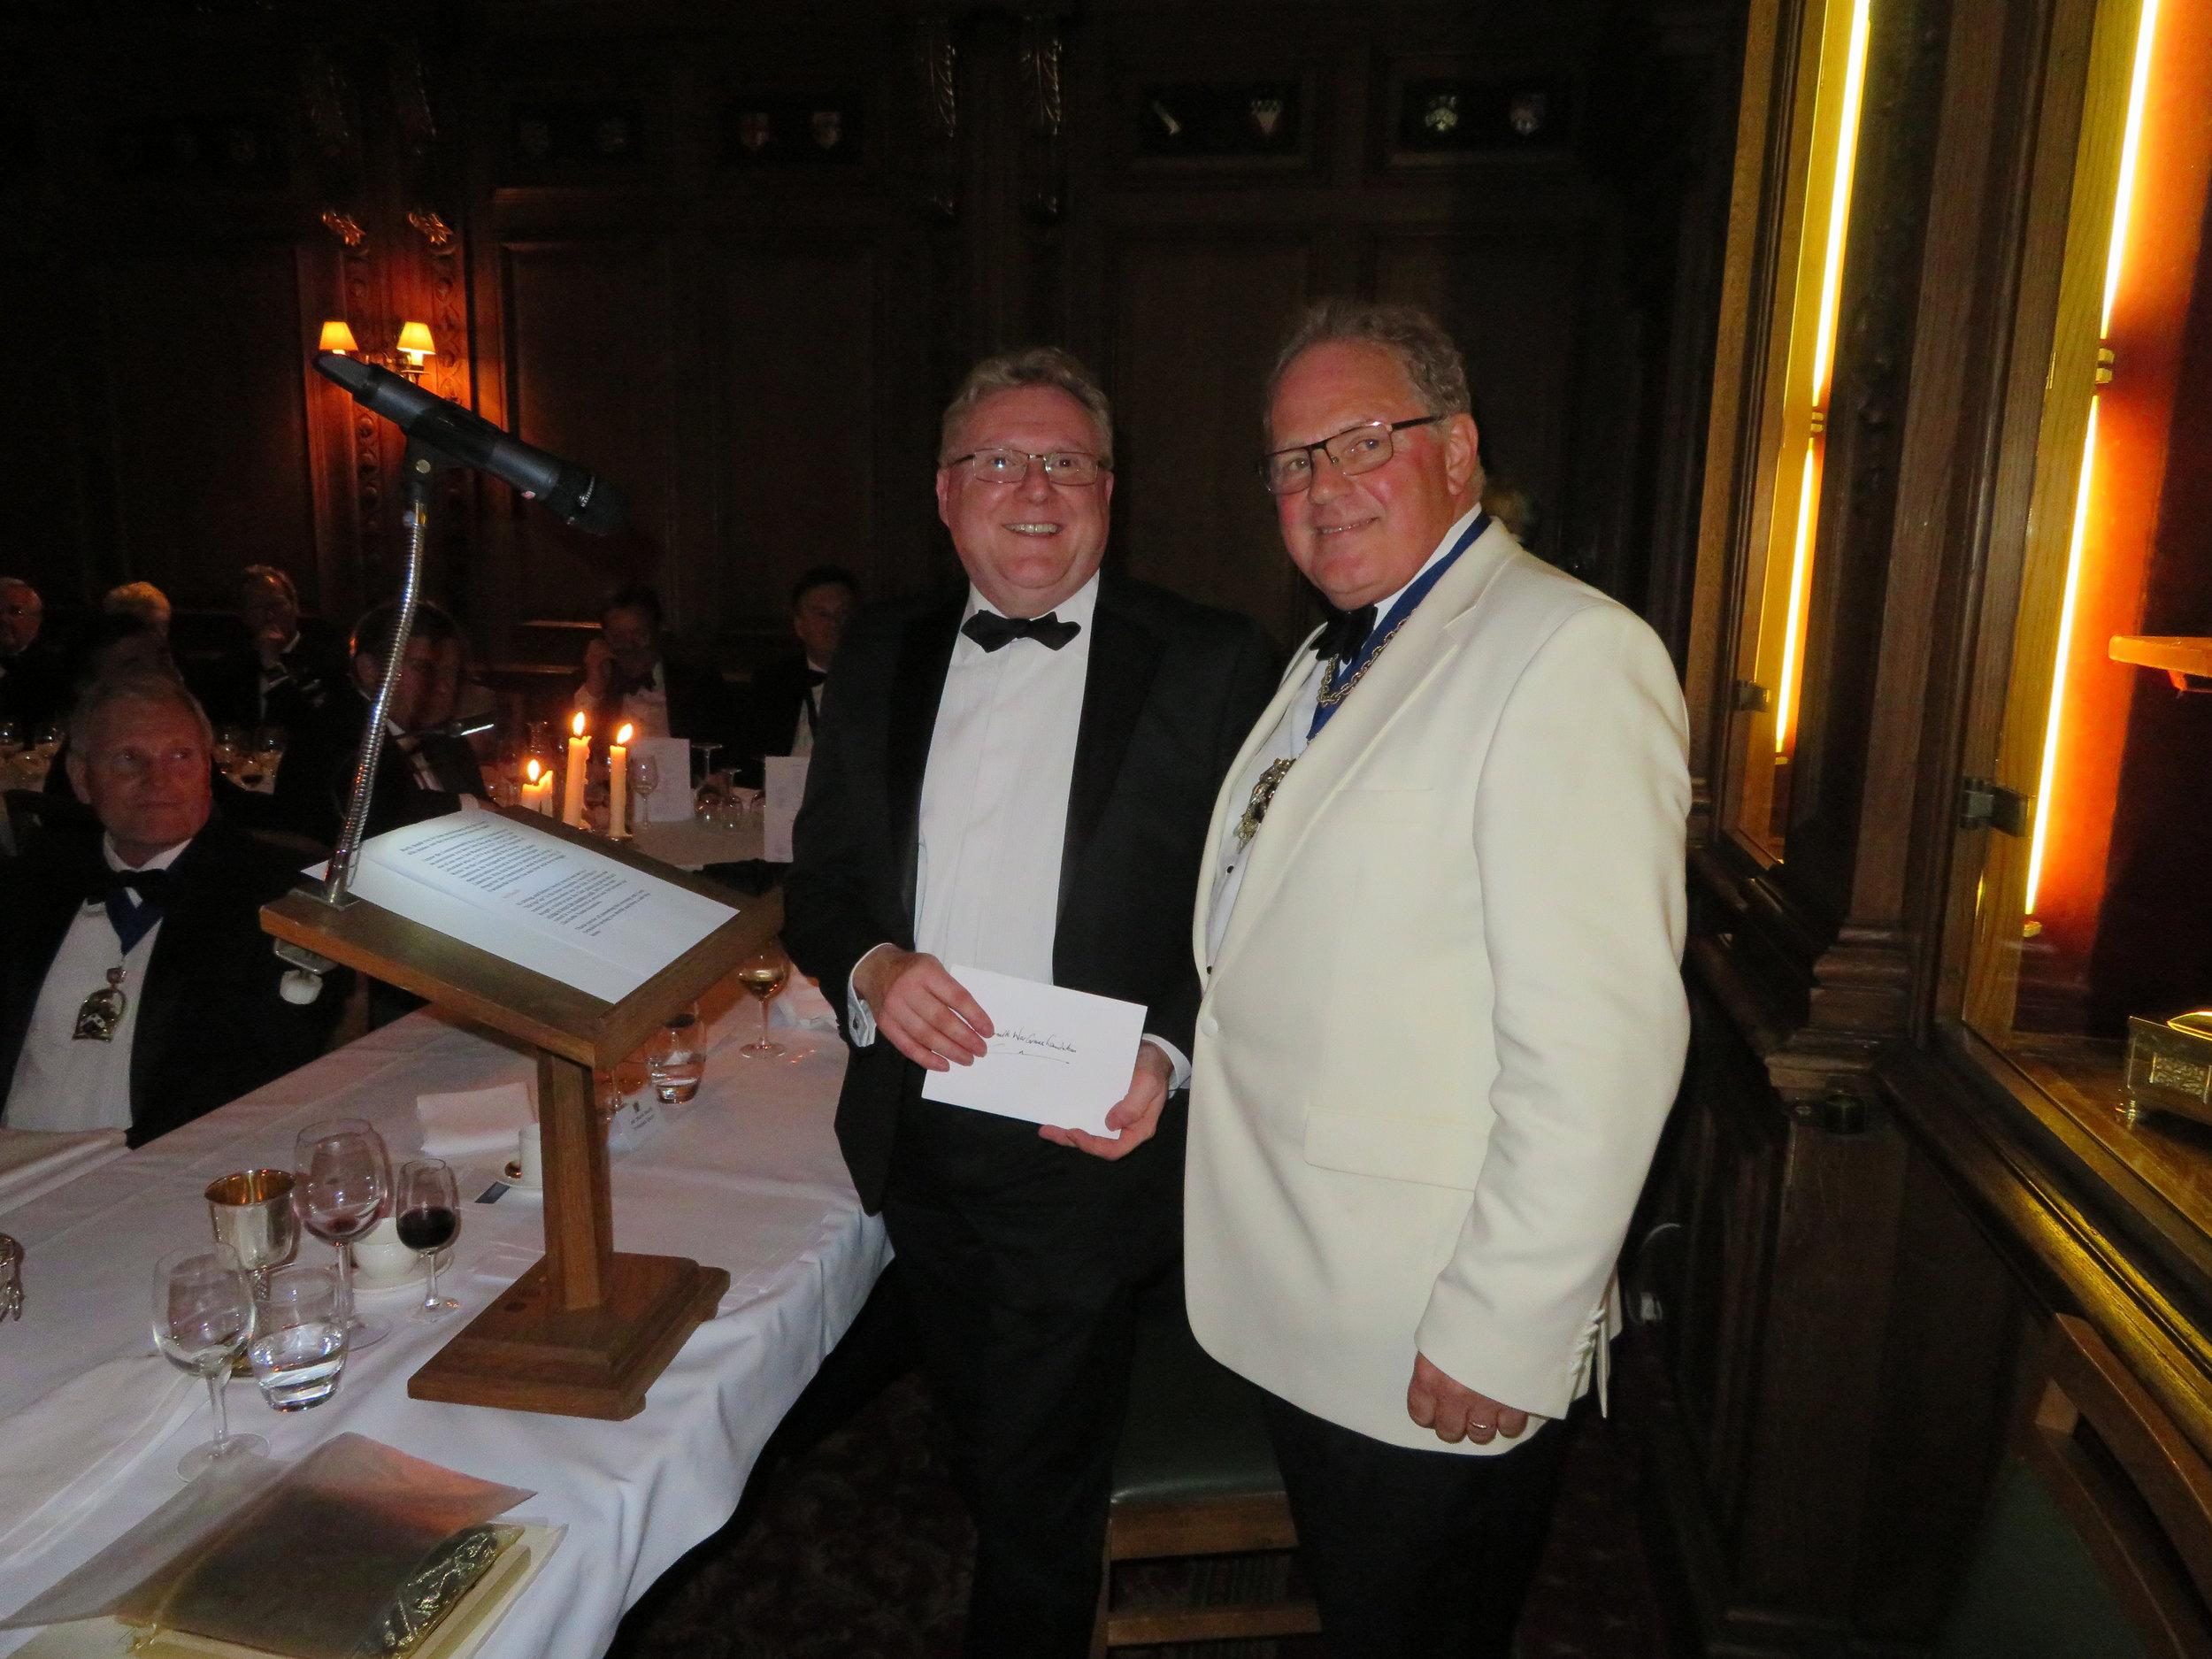 Mark Smith, Principal Guest & The Master